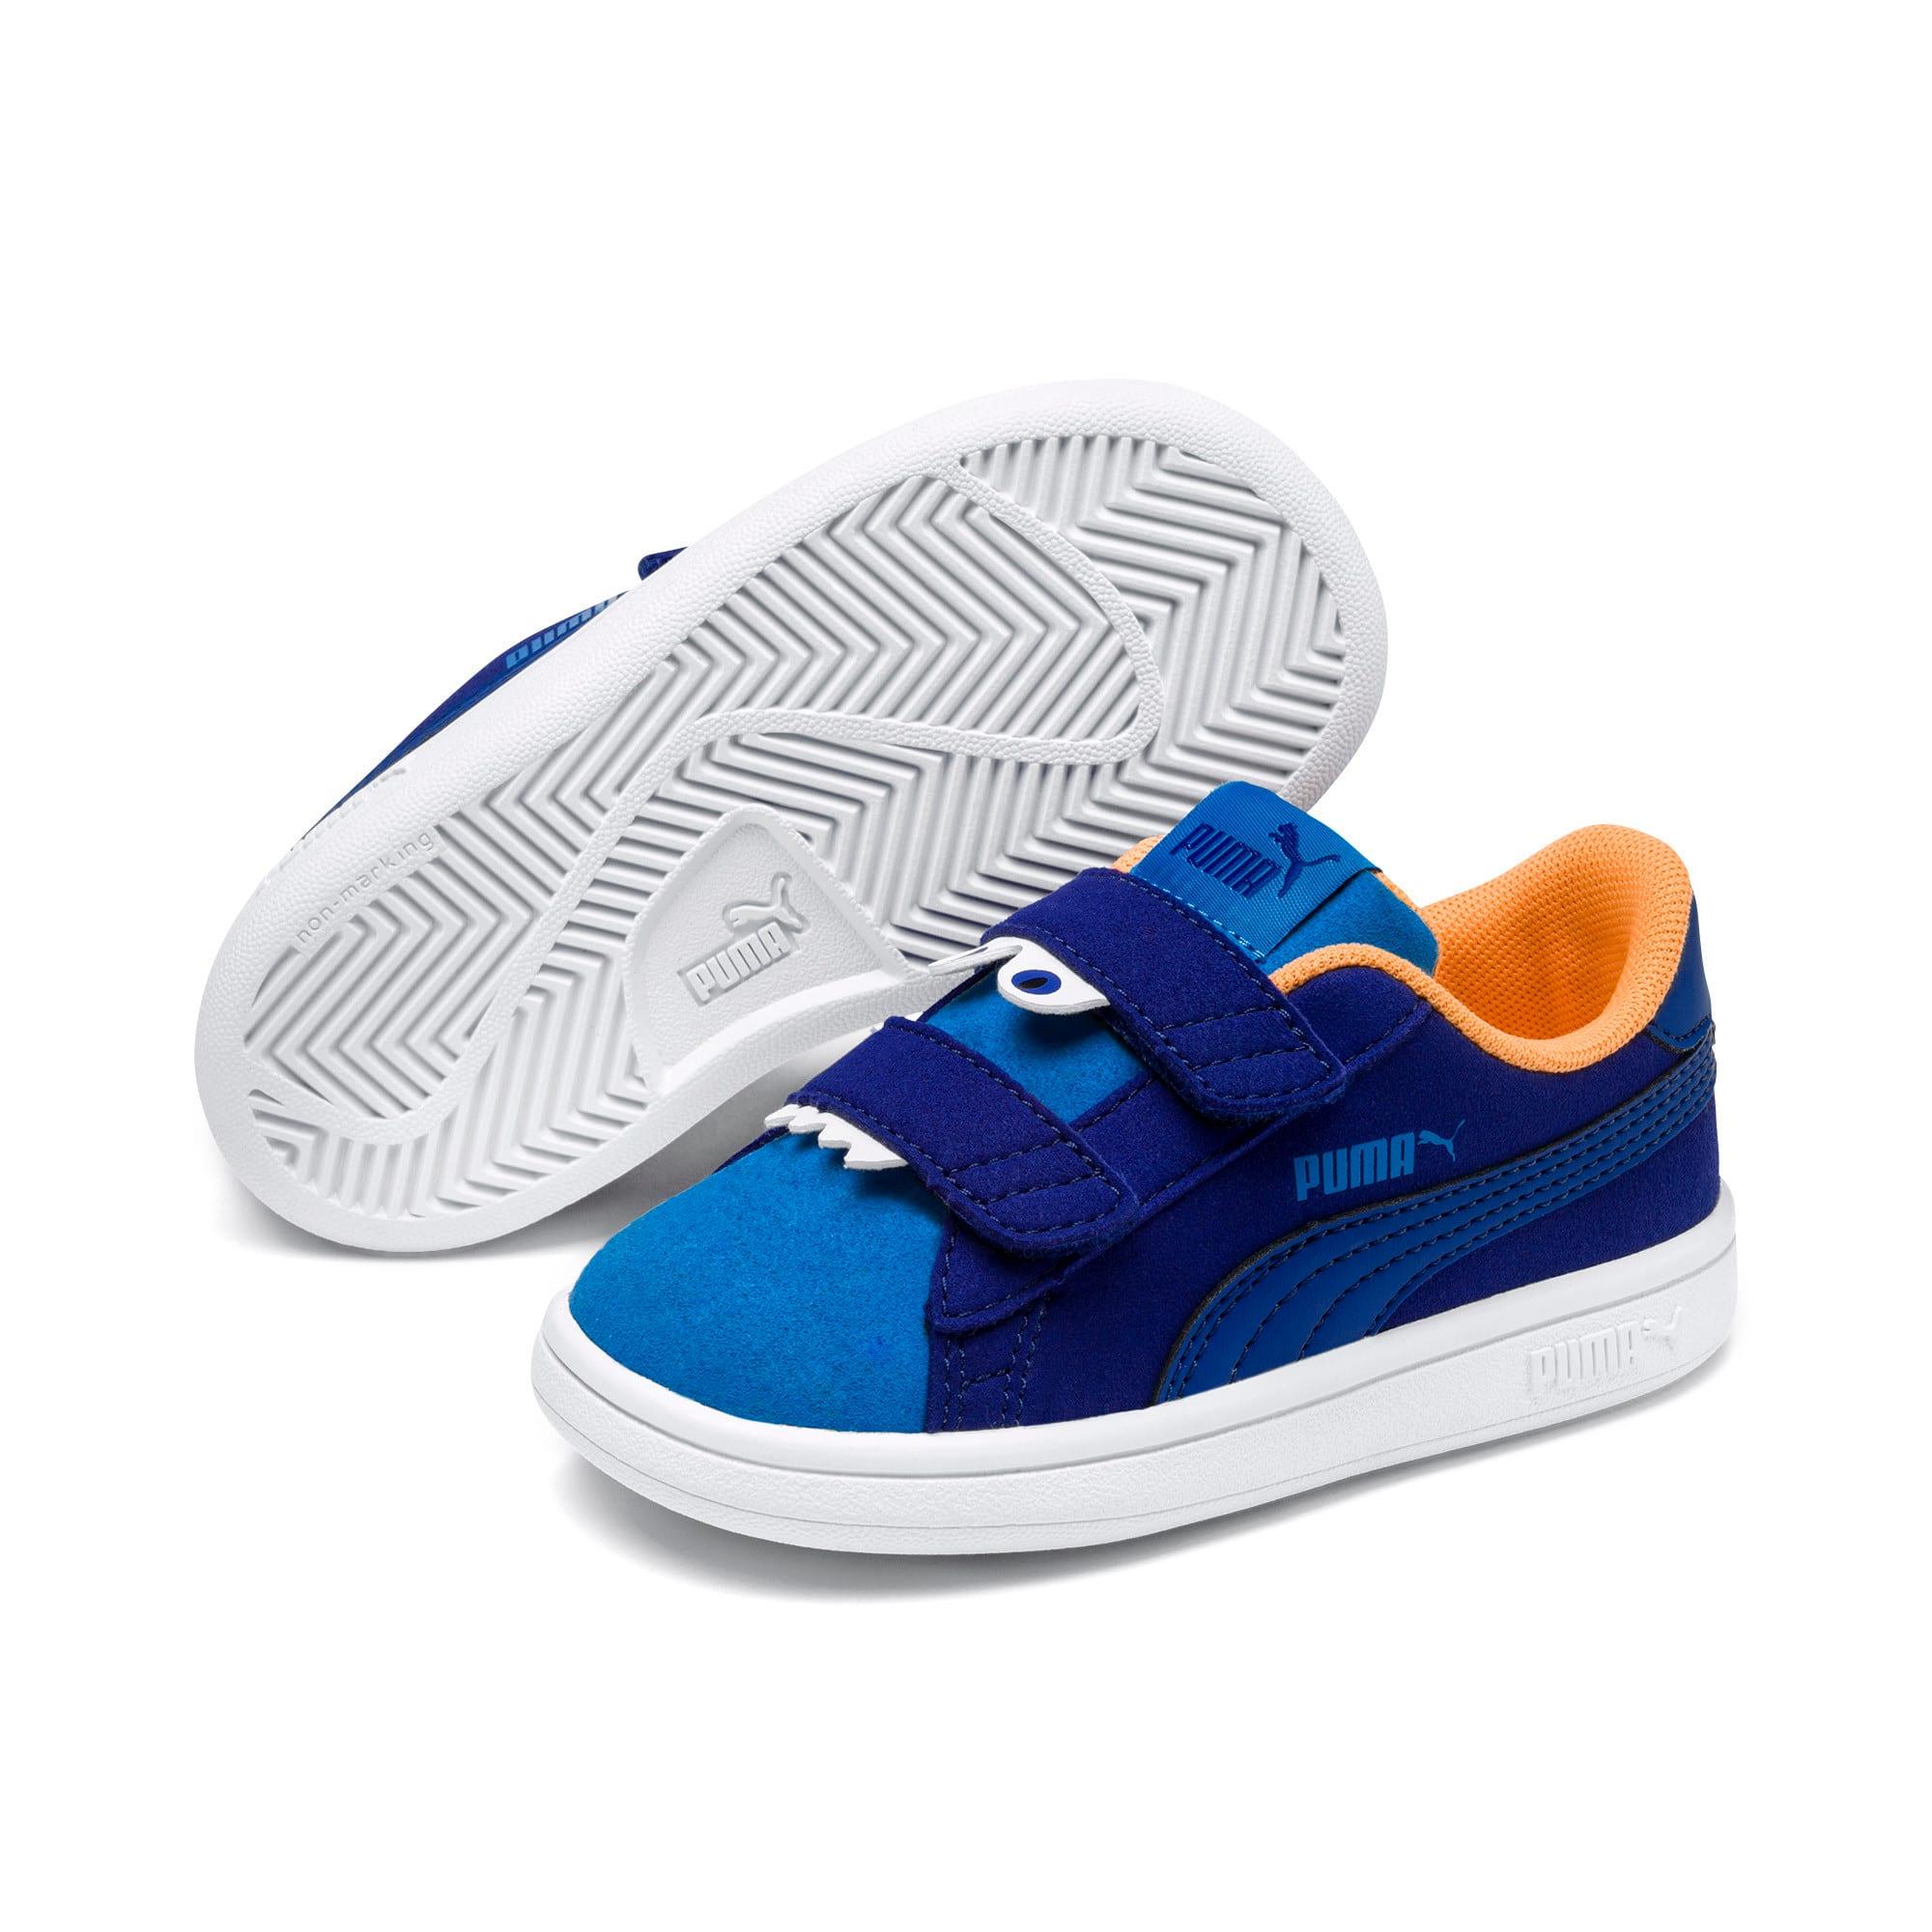 Thumbnail 2 of PUMA Smash v2 Monster Little Kids' Shoes, Sf Th Wb-I Bunting-Ornge-Wht, medium